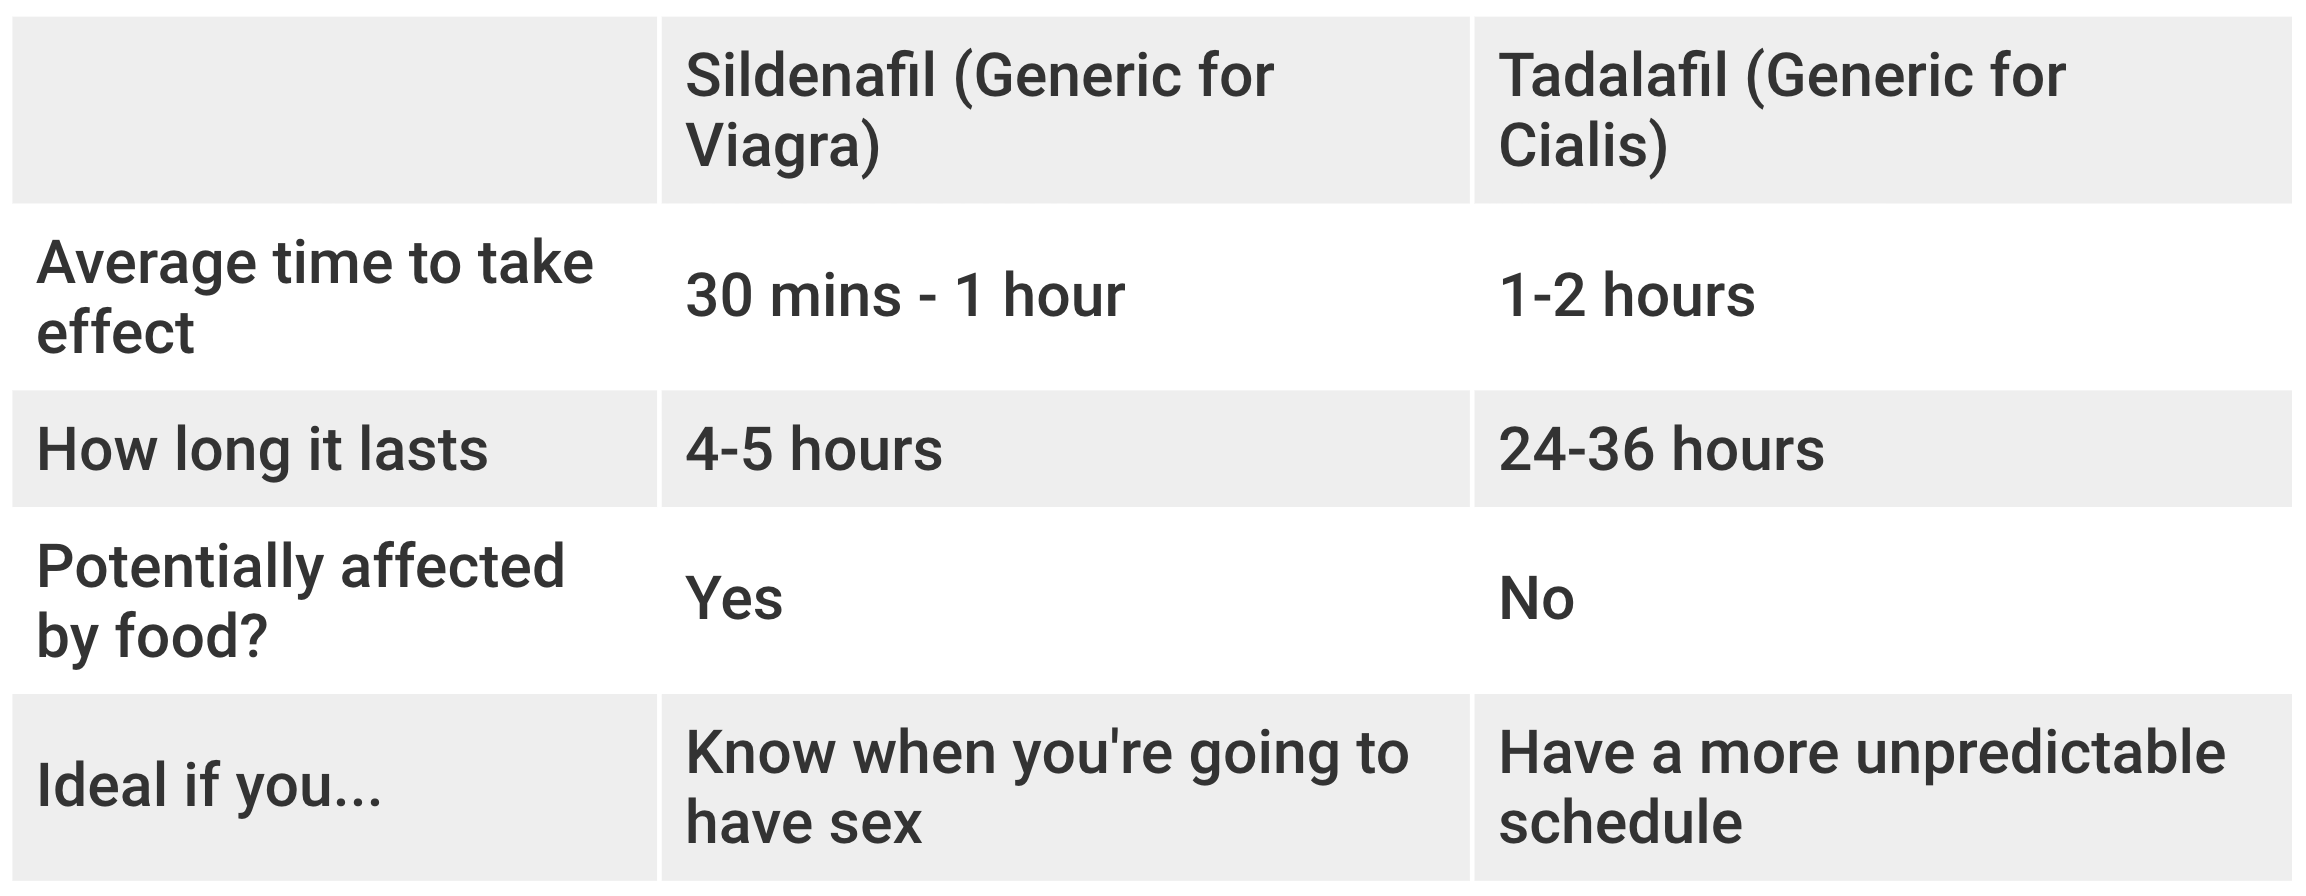 Comparison chart for Sildenafil (Viagra) vs Tadalafil (Cialis)